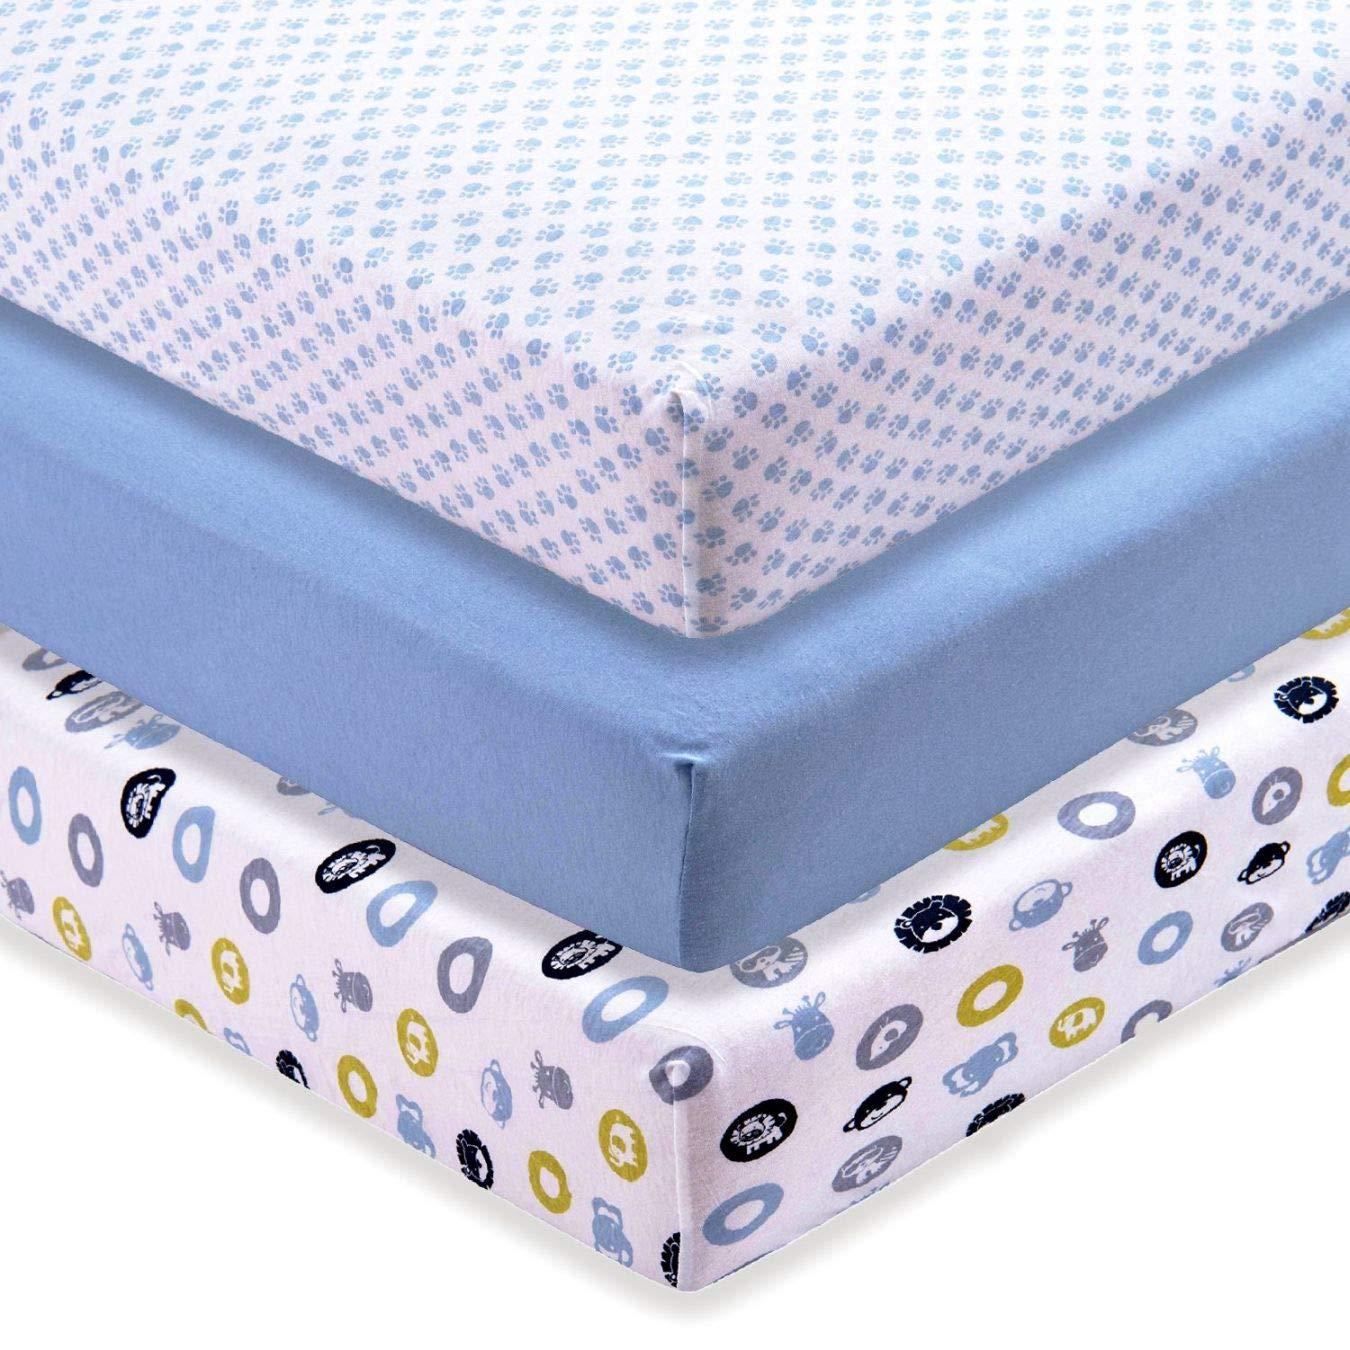 M&Y Fitted Crib Sheets (3-Pack), Boys, 52x28x9 in by M&Y